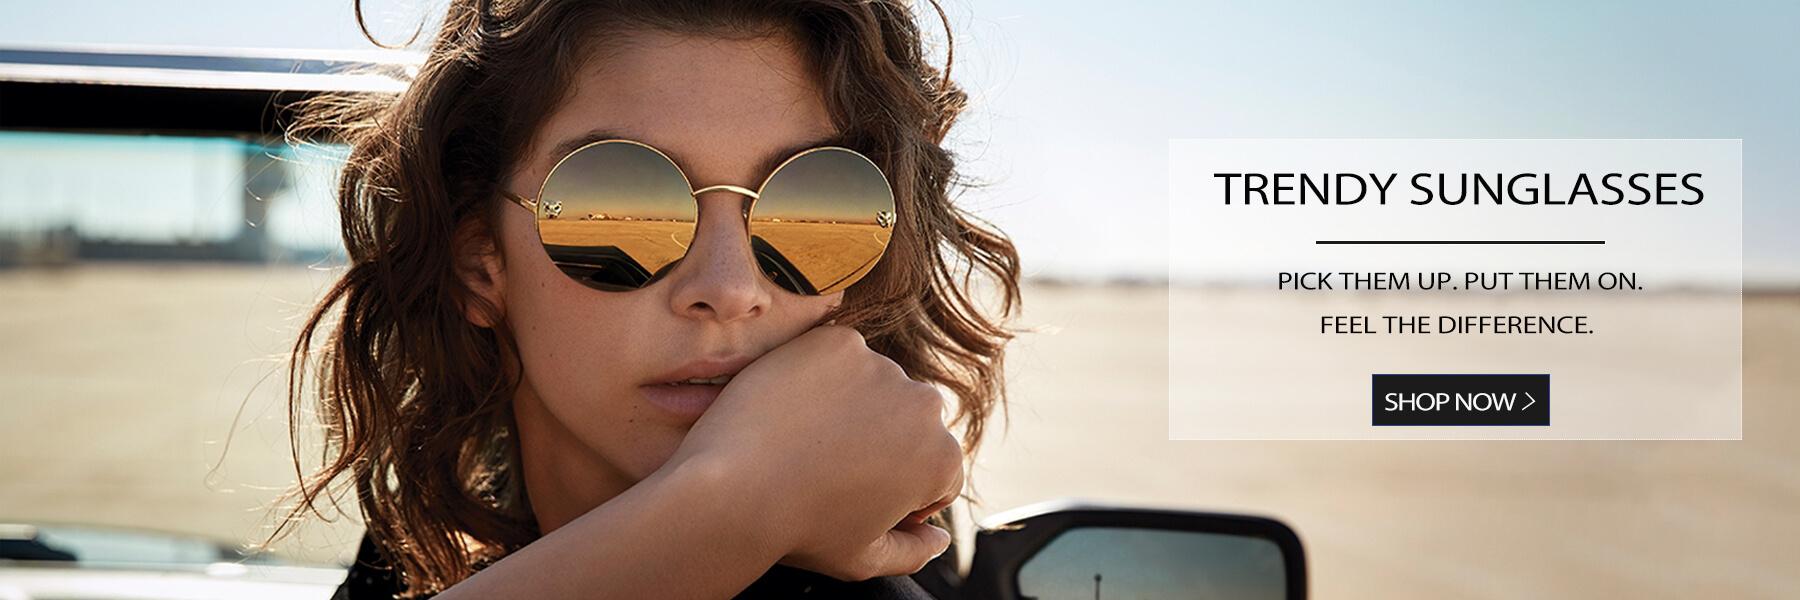 Wholesale Trendy Sunglasses